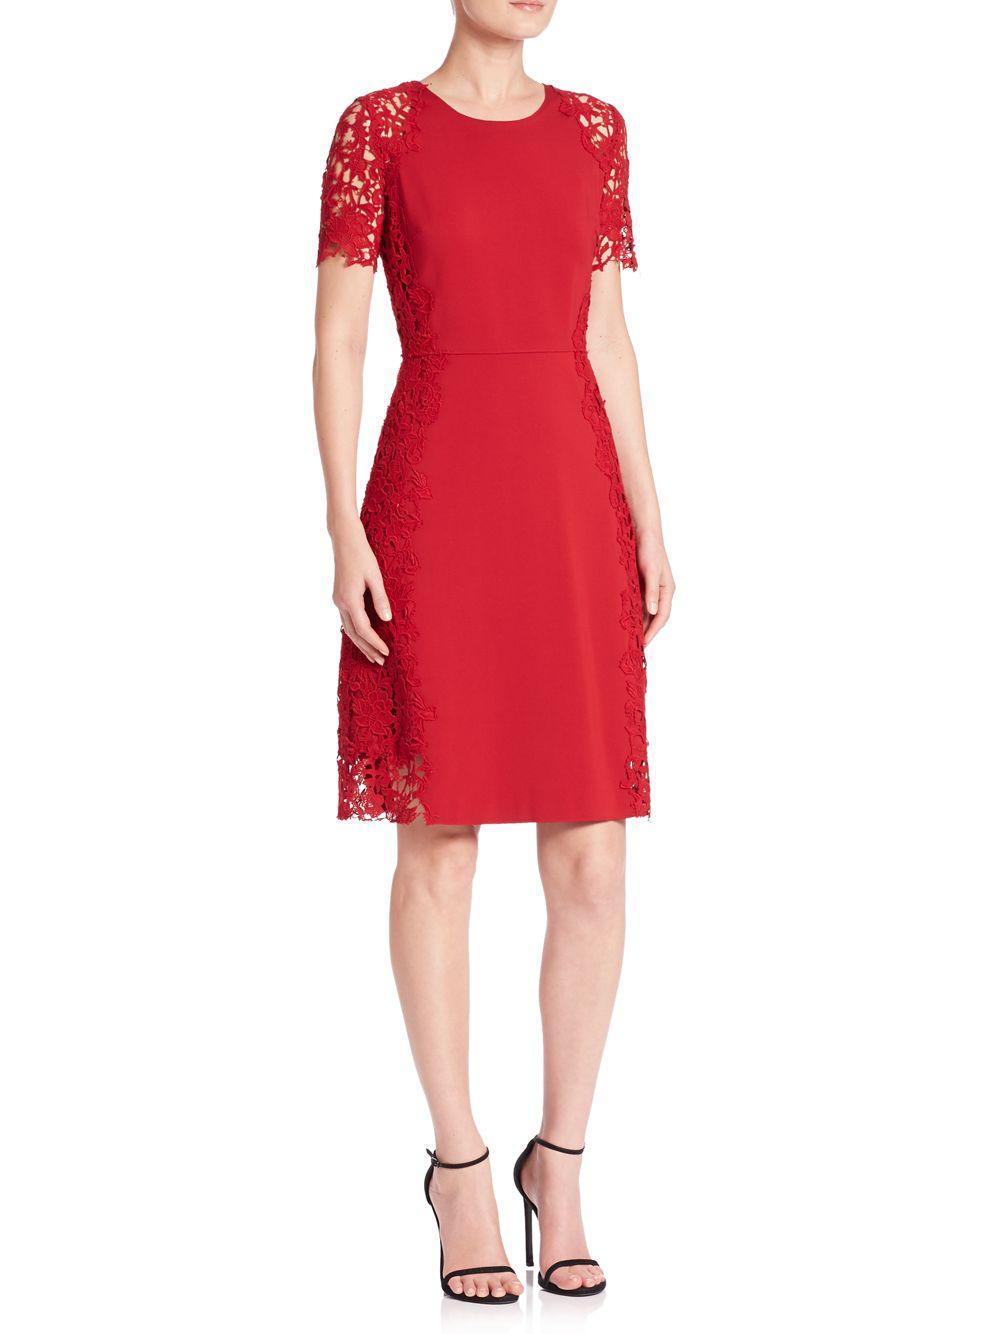 43259ad8ef7a Lyst - Elie Tahari Hudson Lace Trim A-line Dress in Red